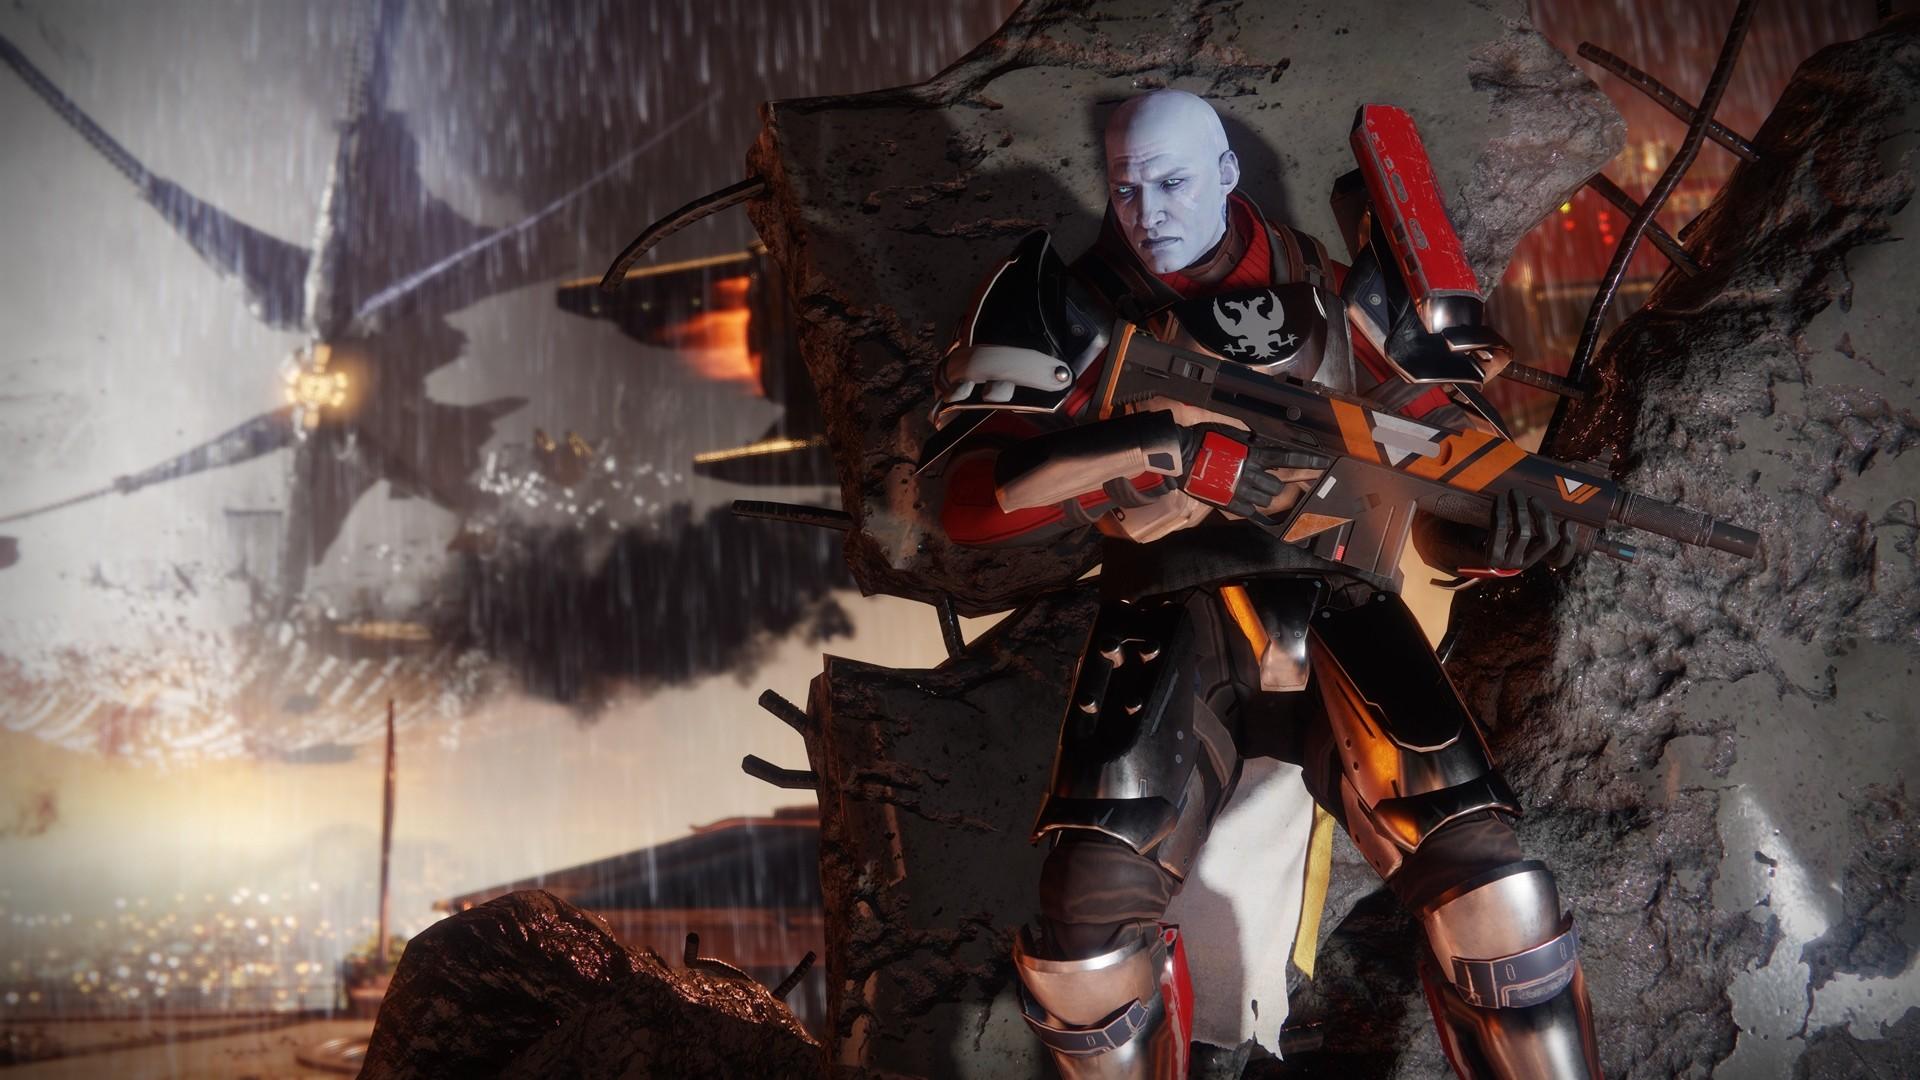 Nice Destiny 2 Zavala Titan Guardian wallpaper